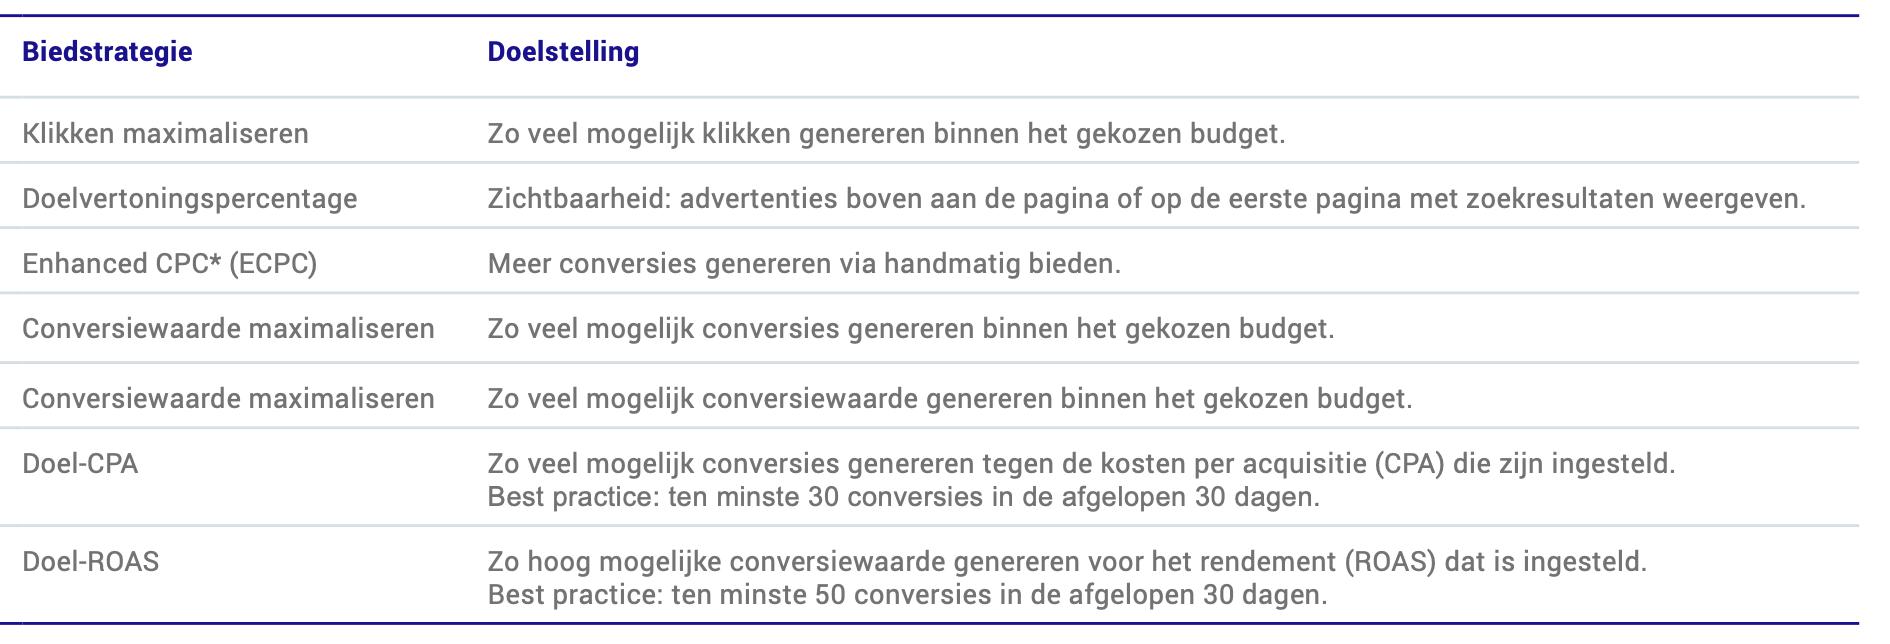 Biedstrategieën in Google Ads DDMA